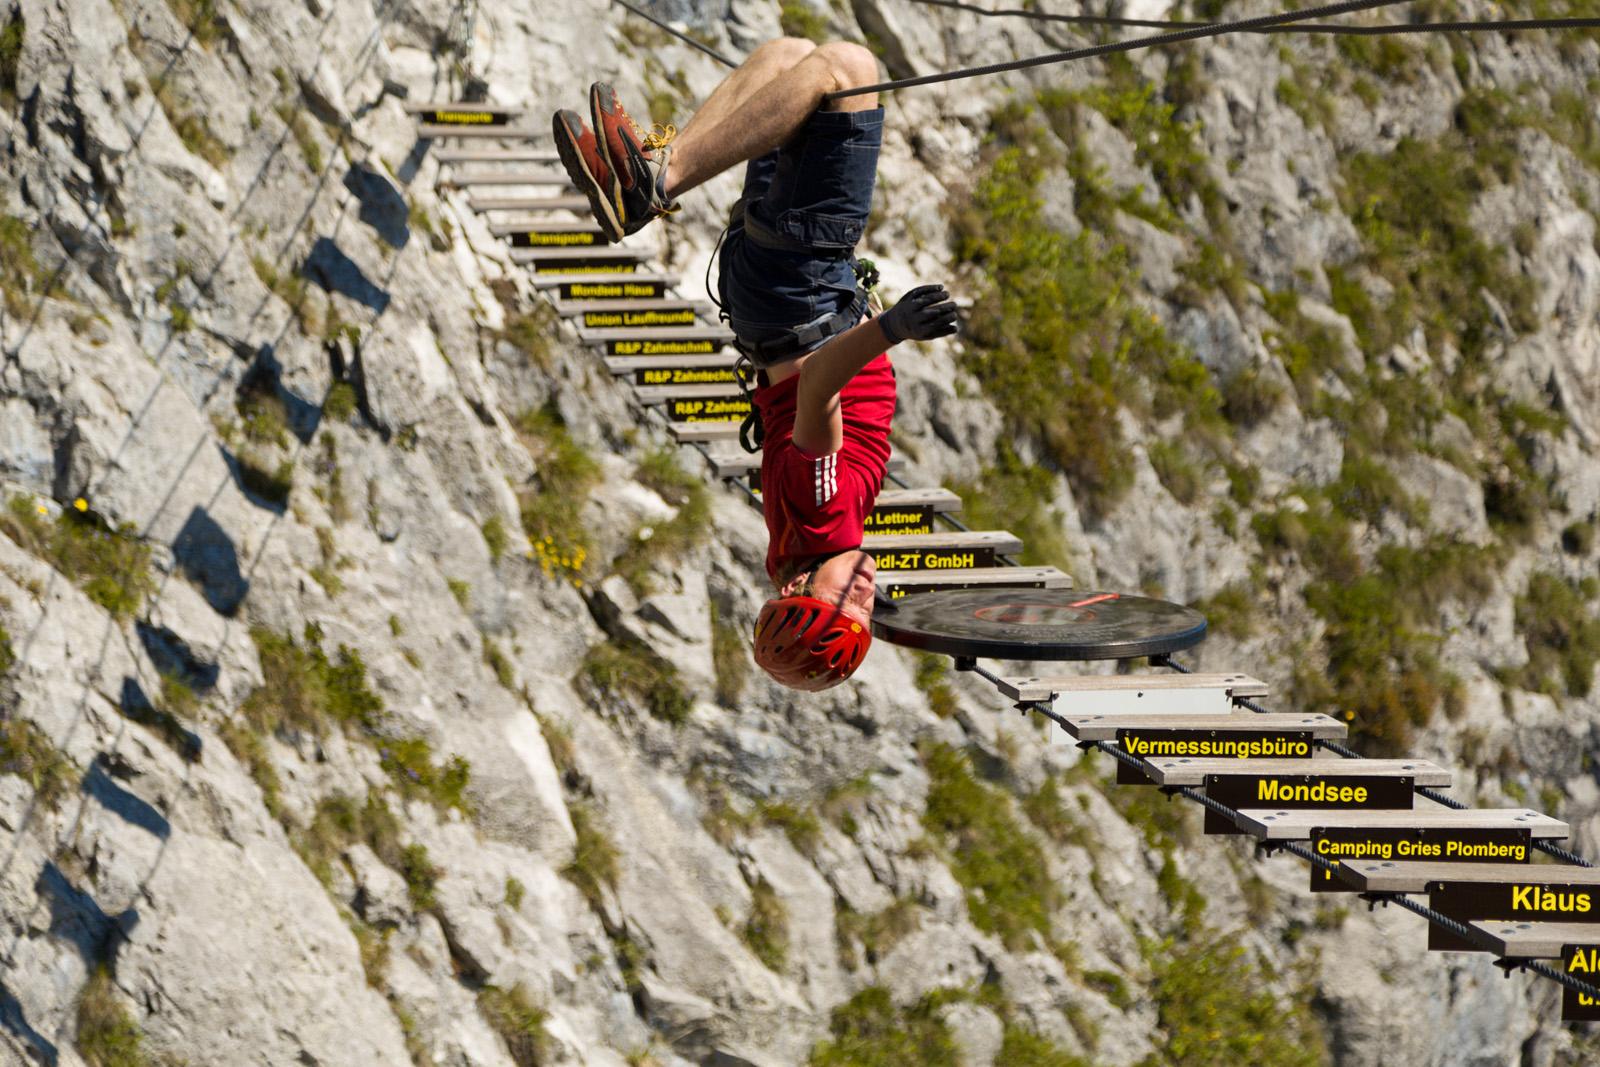 Klettersteig Drachenwand Topo : Überschreitung drachenwand schatzwand schober ii climb and hike